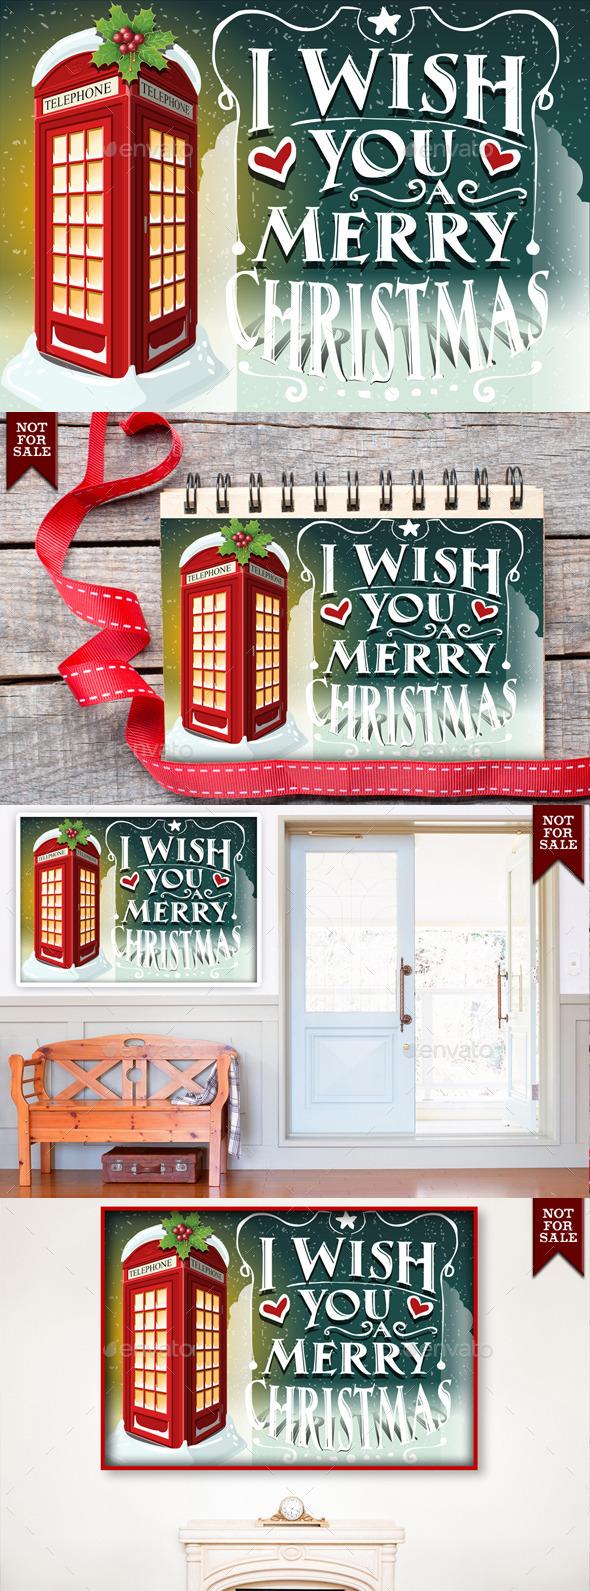 Christmas Greeting Card with English Red Cabin  - Christmas Seasons/Holidays